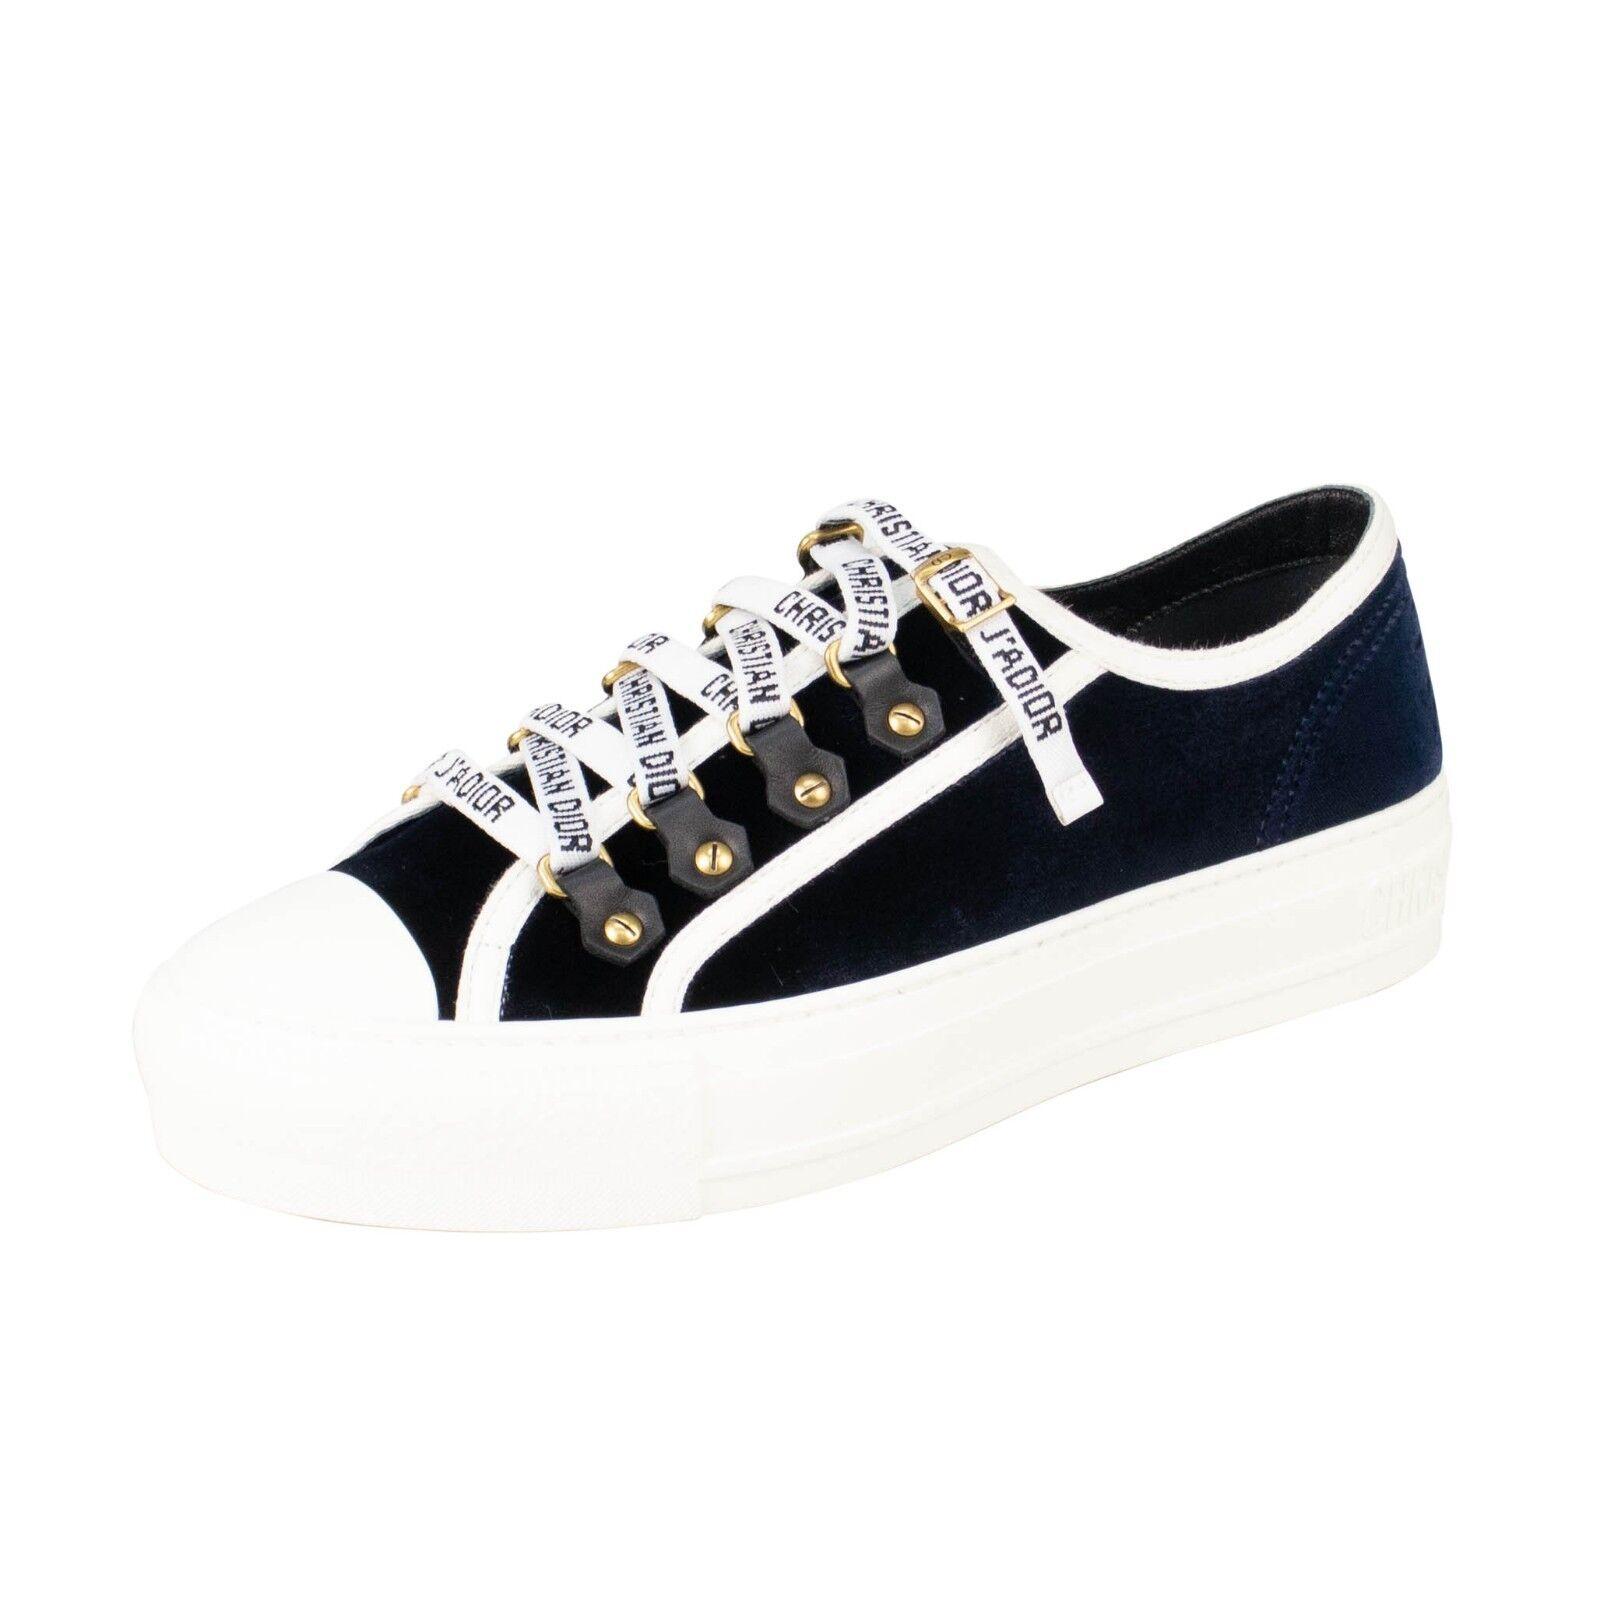 Nuevo En Caja Christian Dior Deep azul Velvet  Walk Tenis 'n' Dior  Tenis Walk Zapatos 8.5 38.5 e3c01f